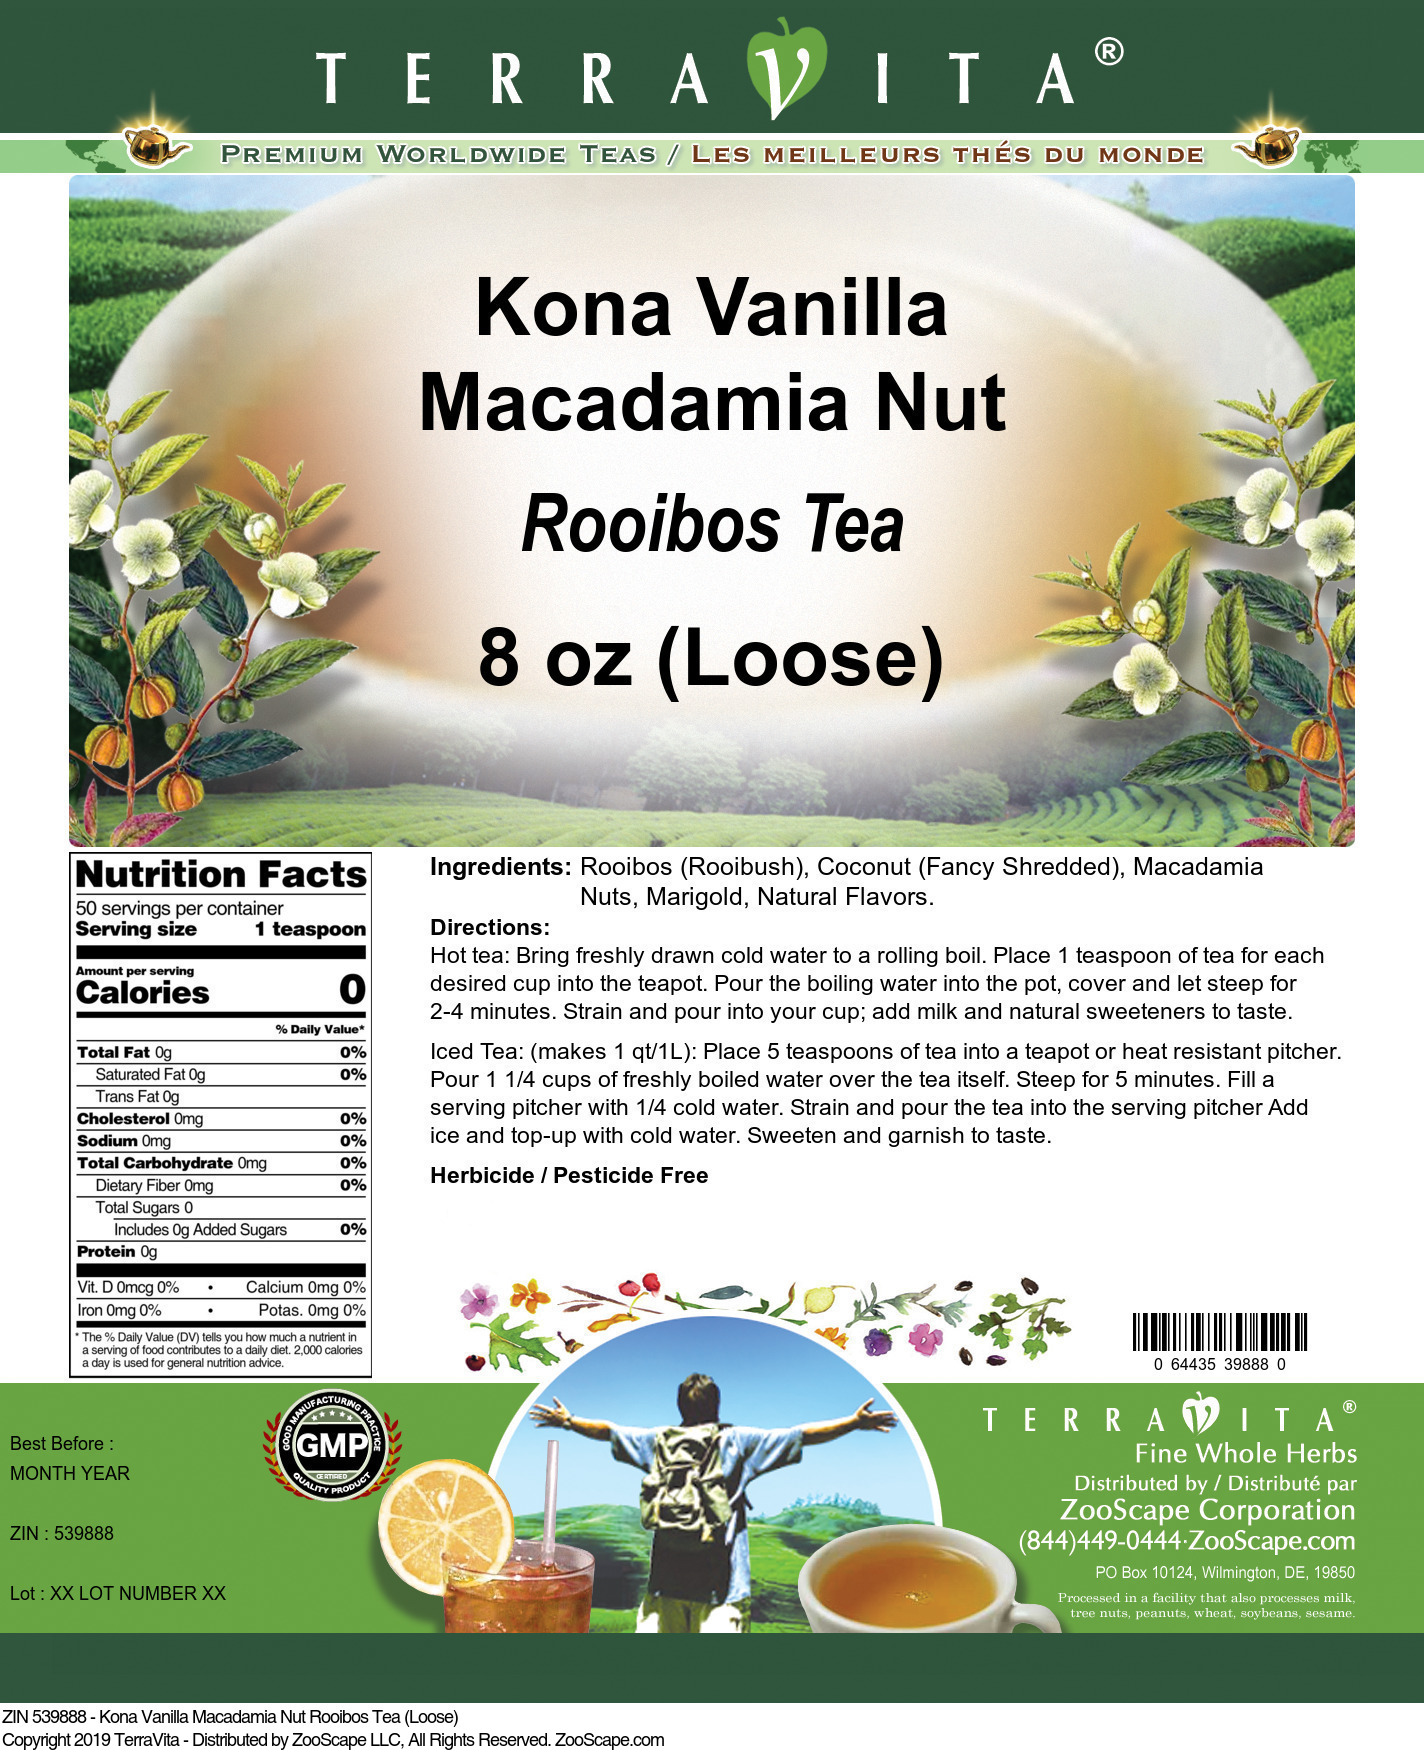 Kona Vanilla Macadamia Nut Rooibos Tea (Loose)